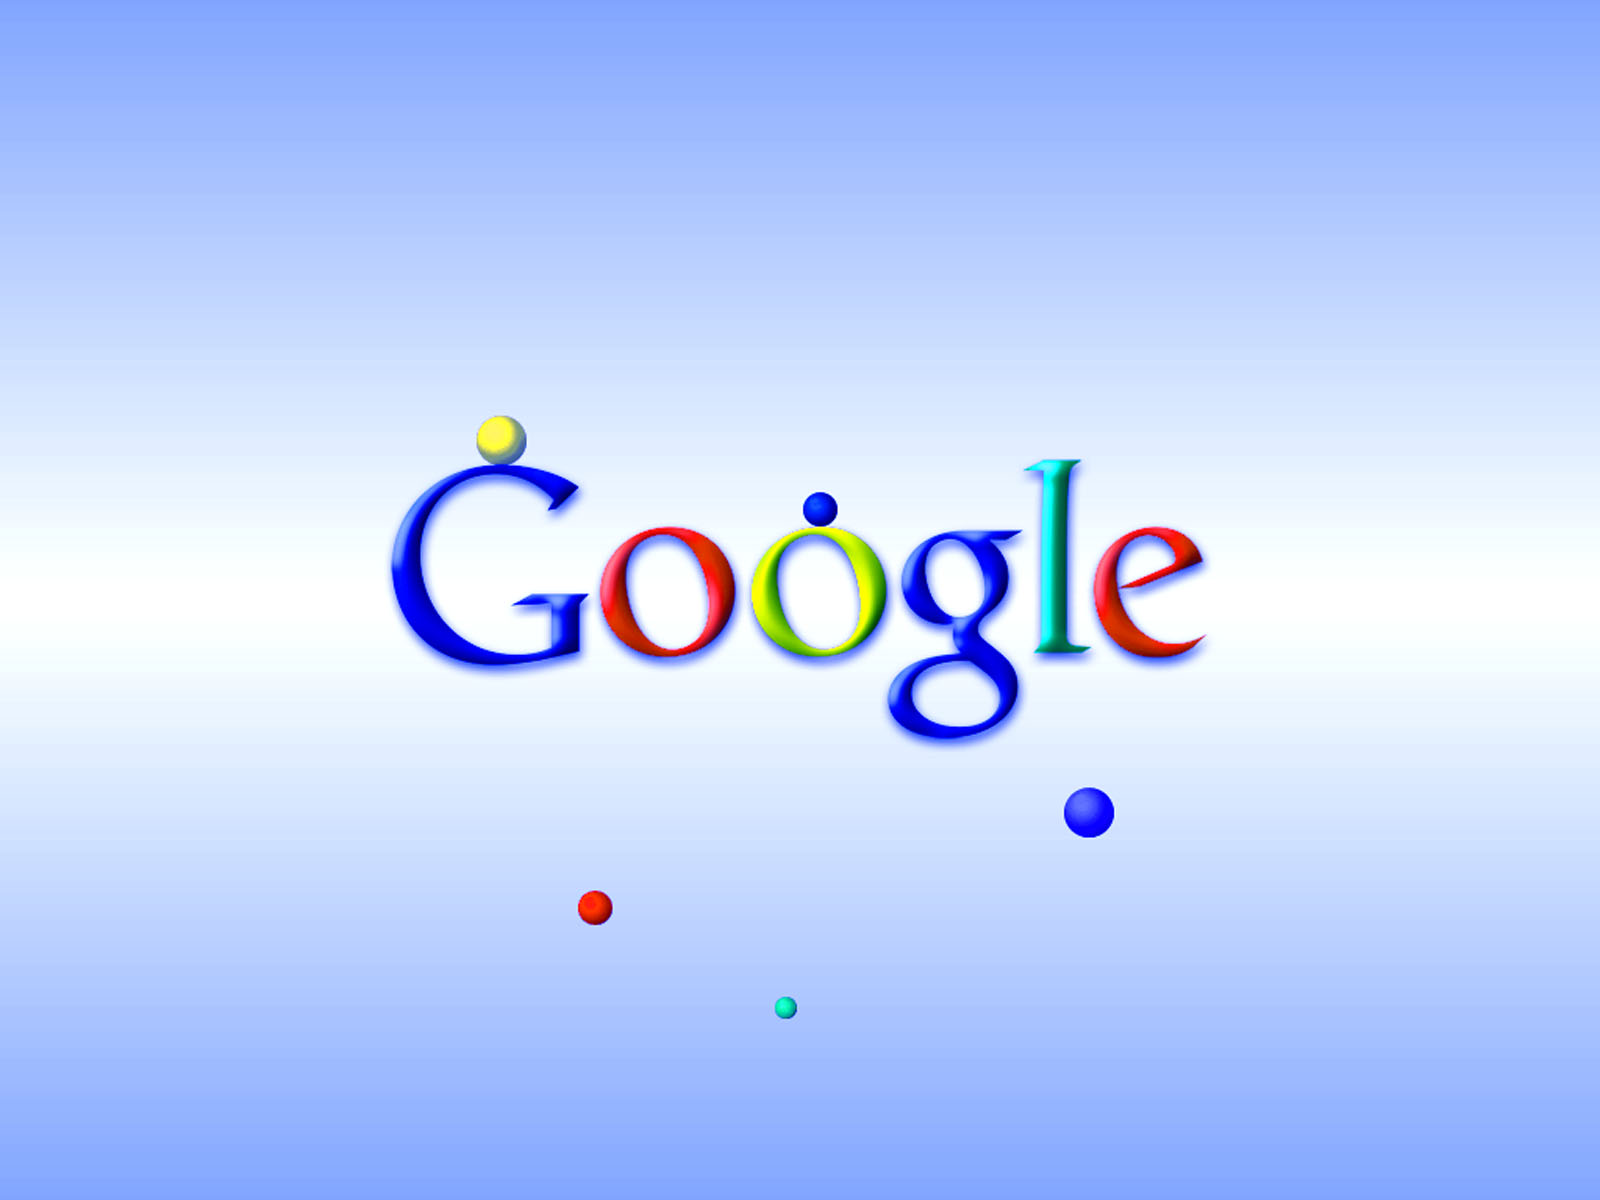 free google background images wallpapersafari